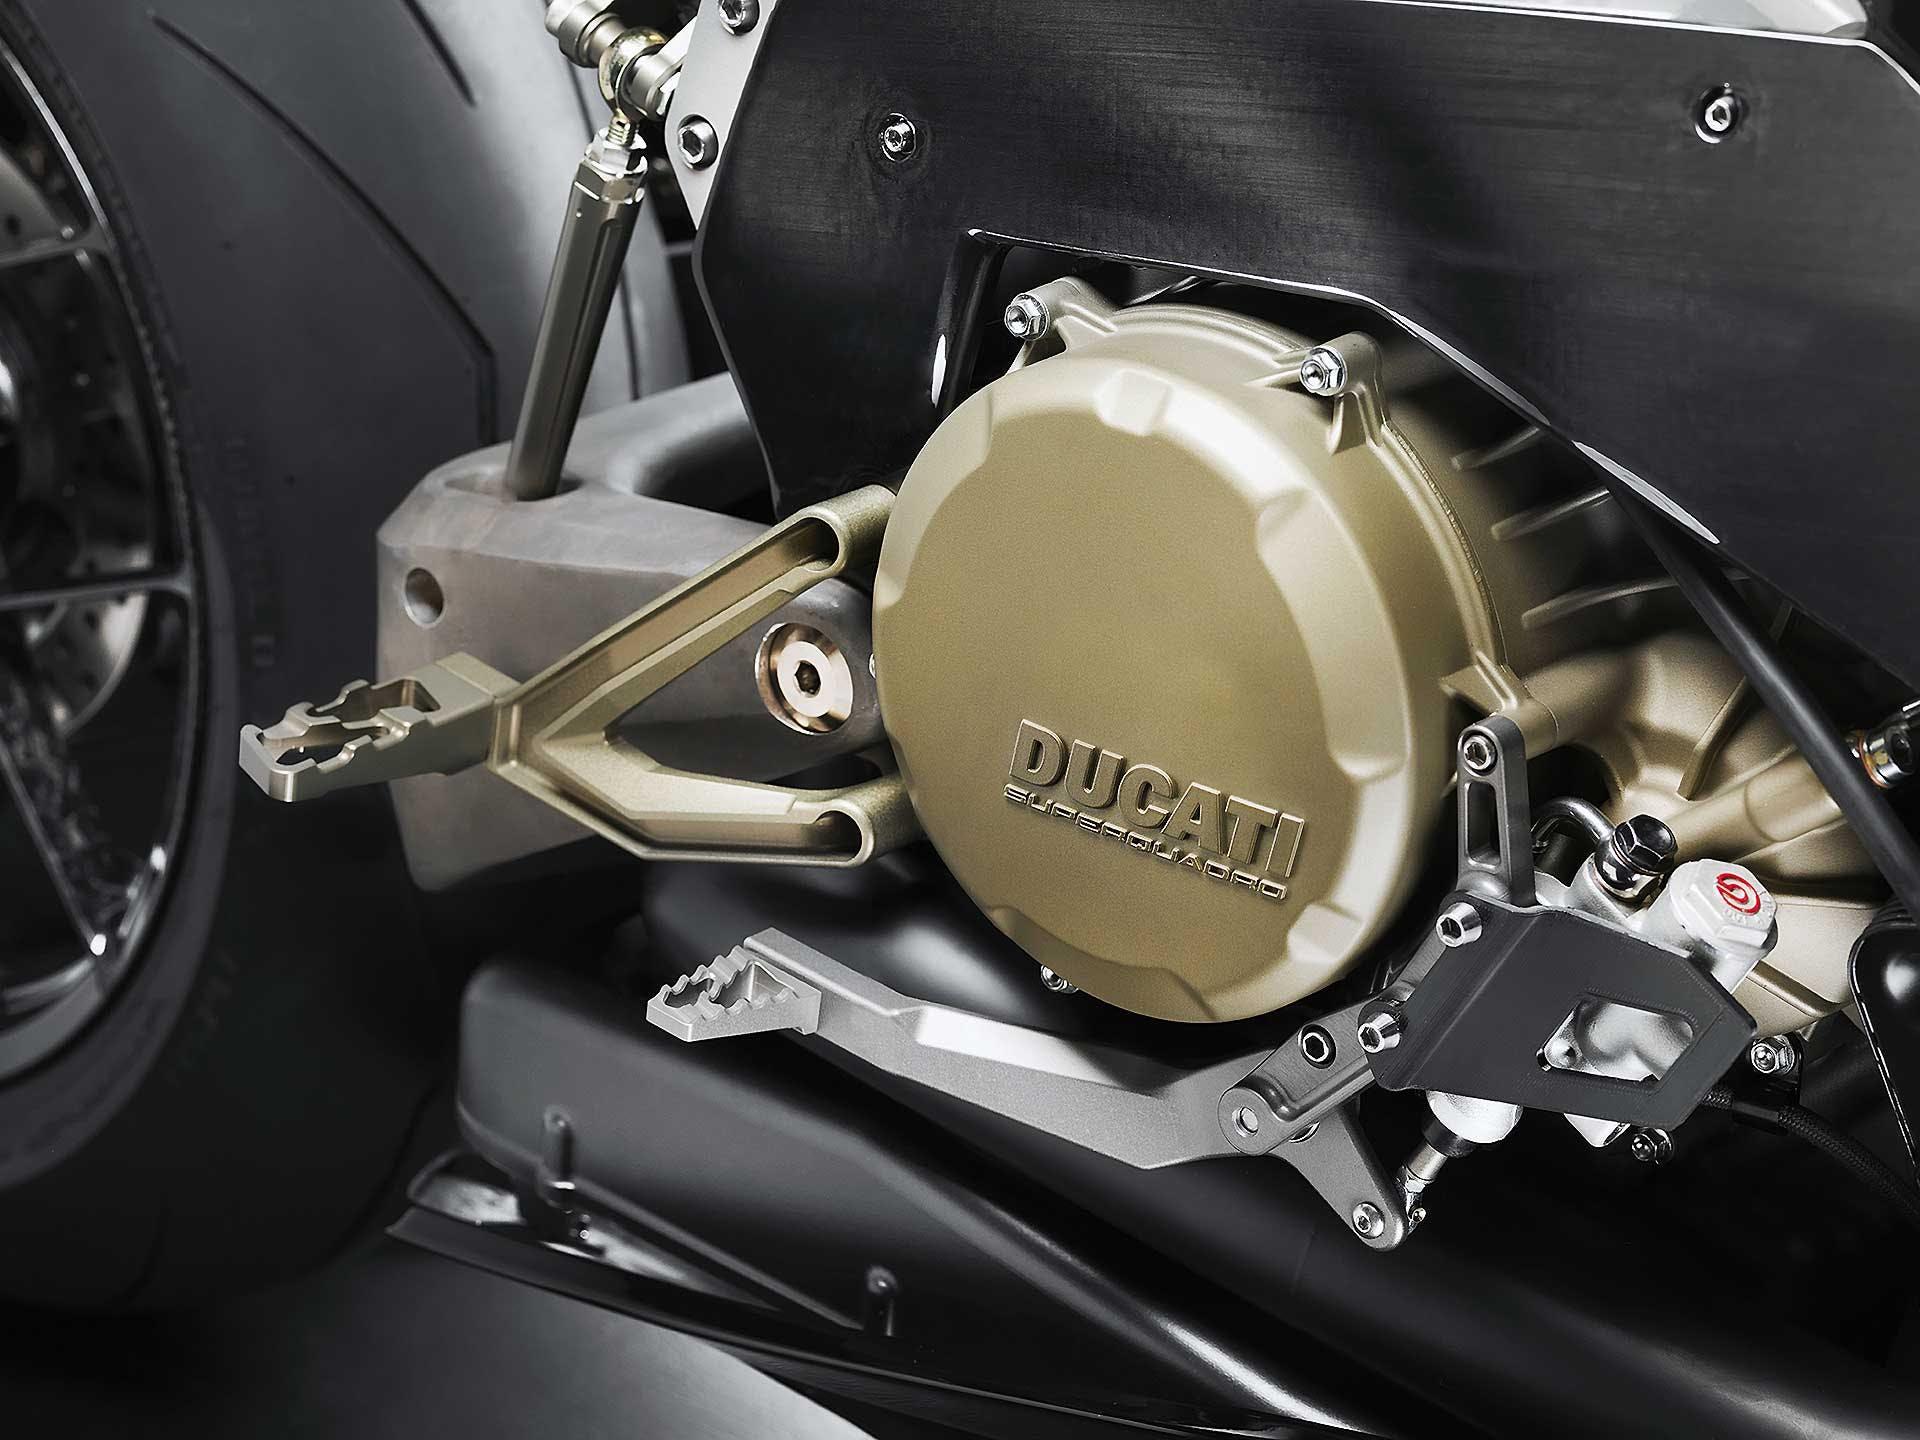 Vyrus Alyen Motore Ducati Superquadro